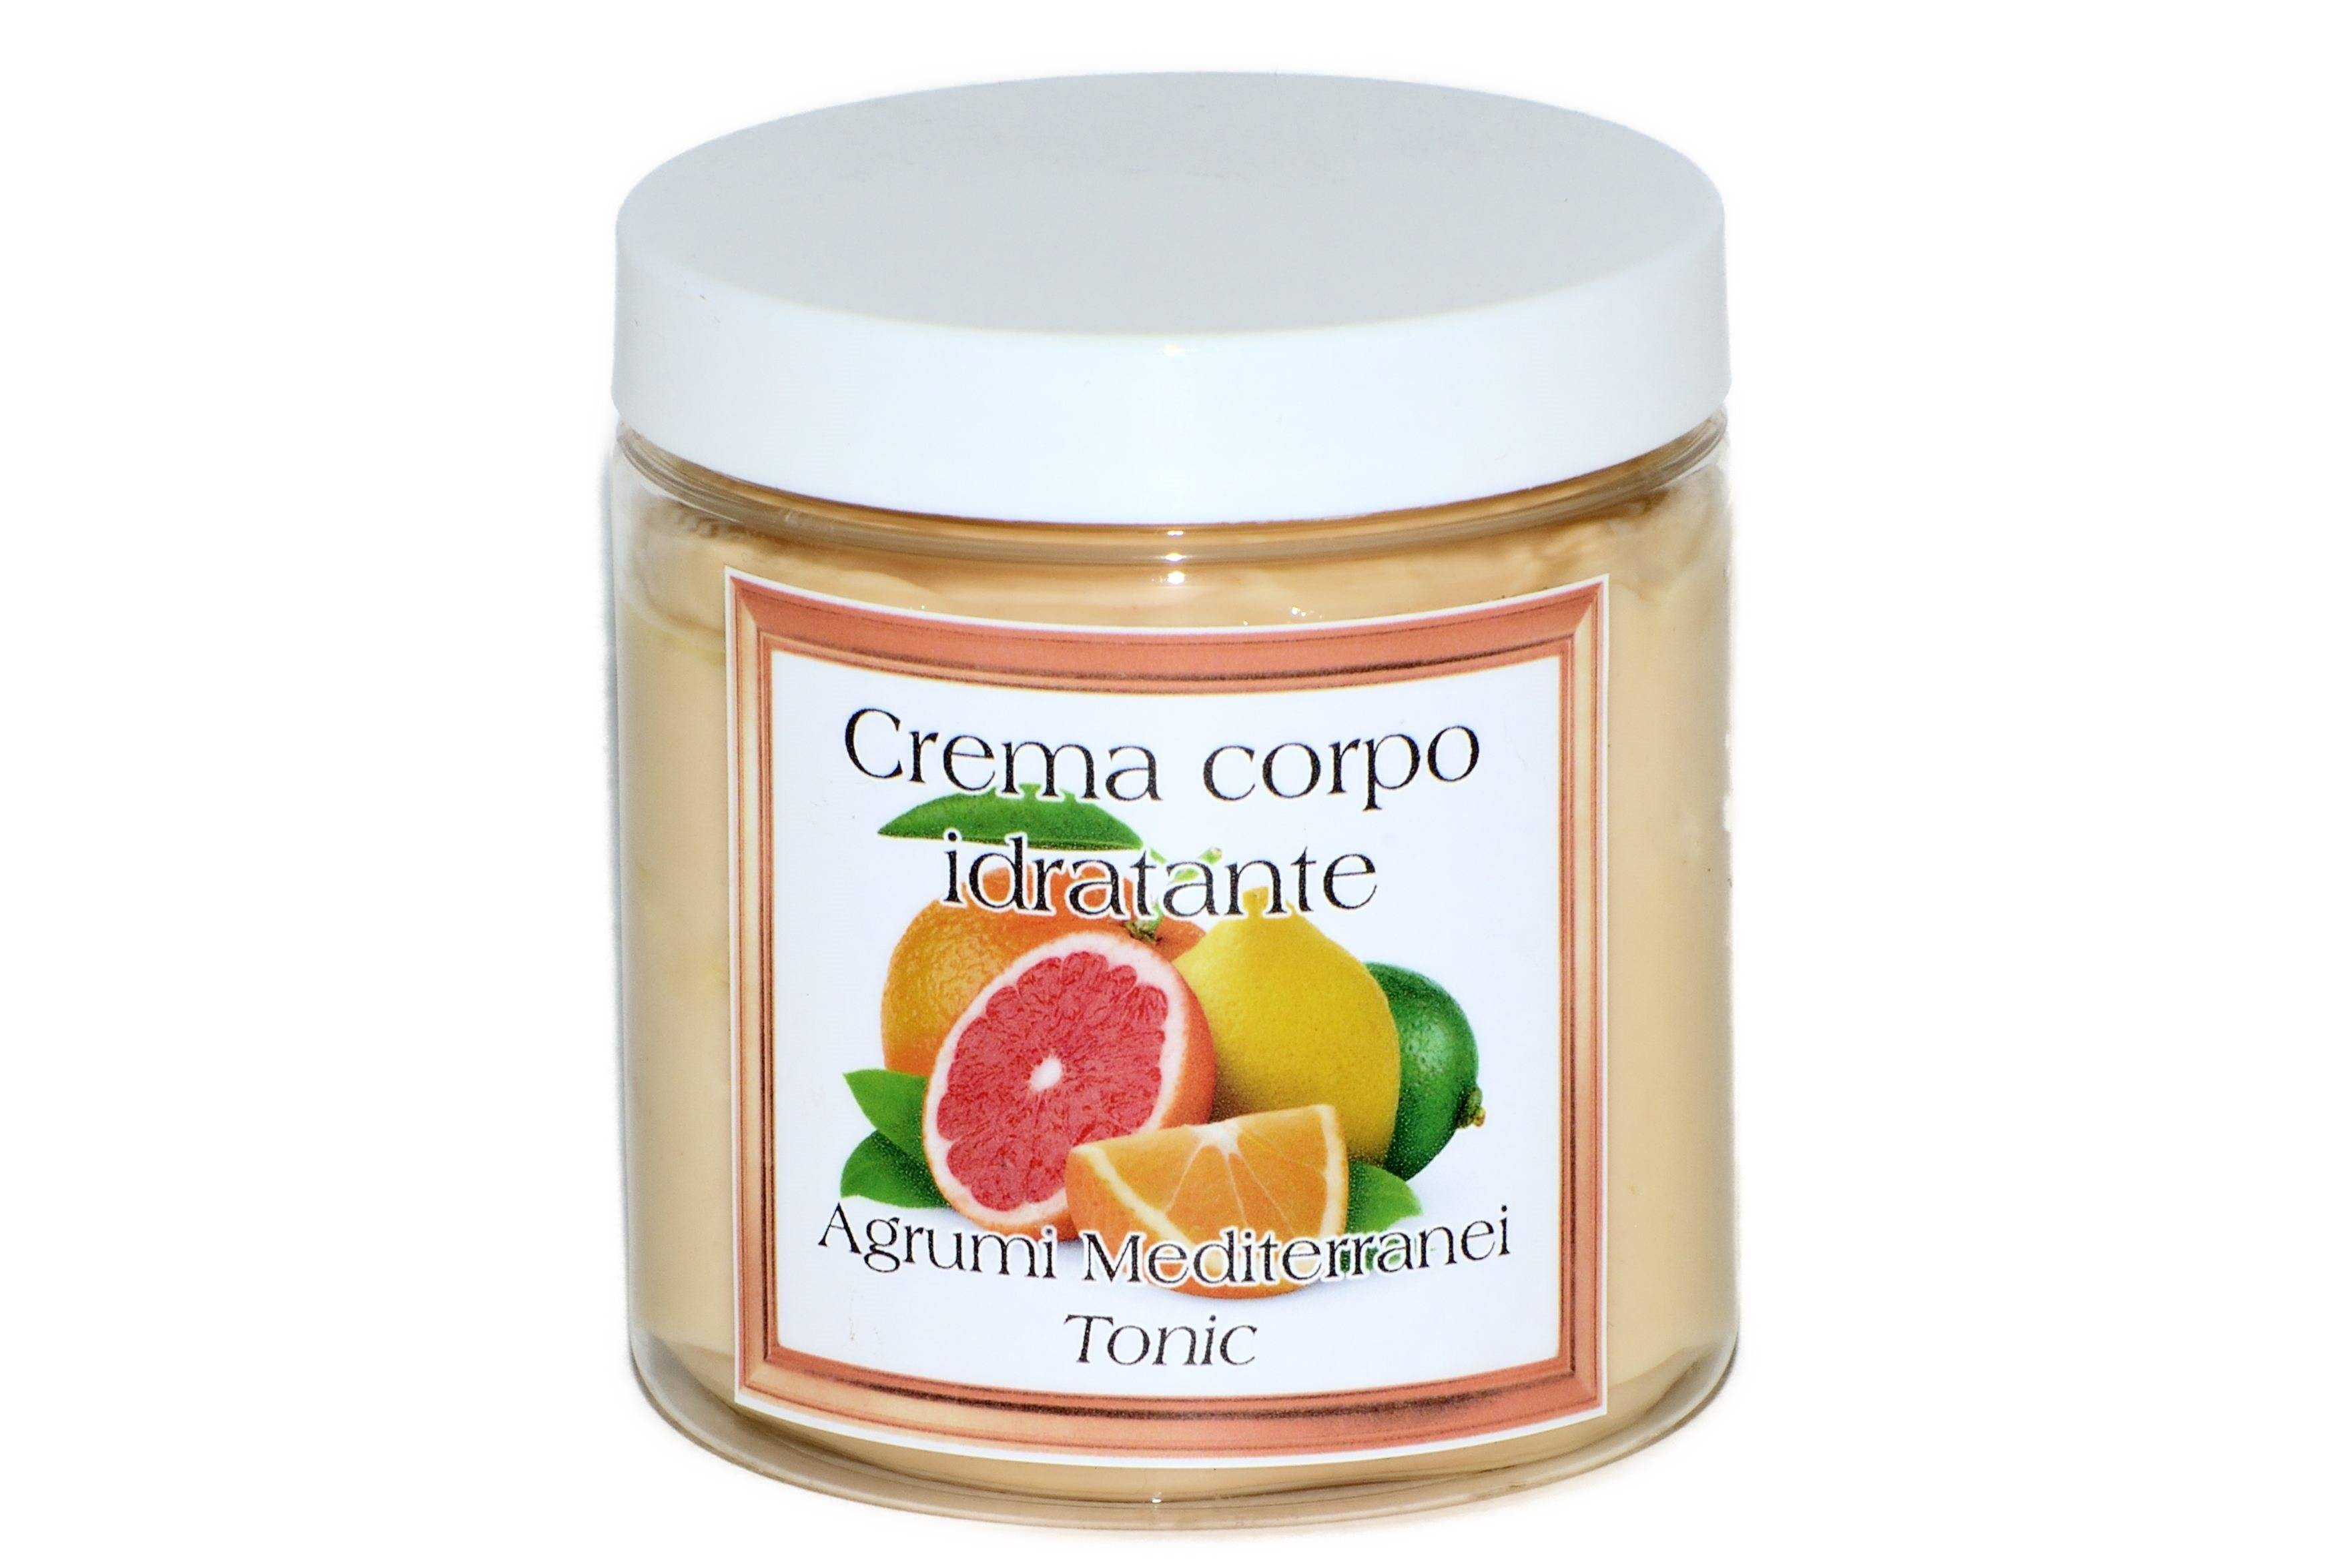 Centisia Crema corpo Agrumi Mediterranei TONIC 250ml